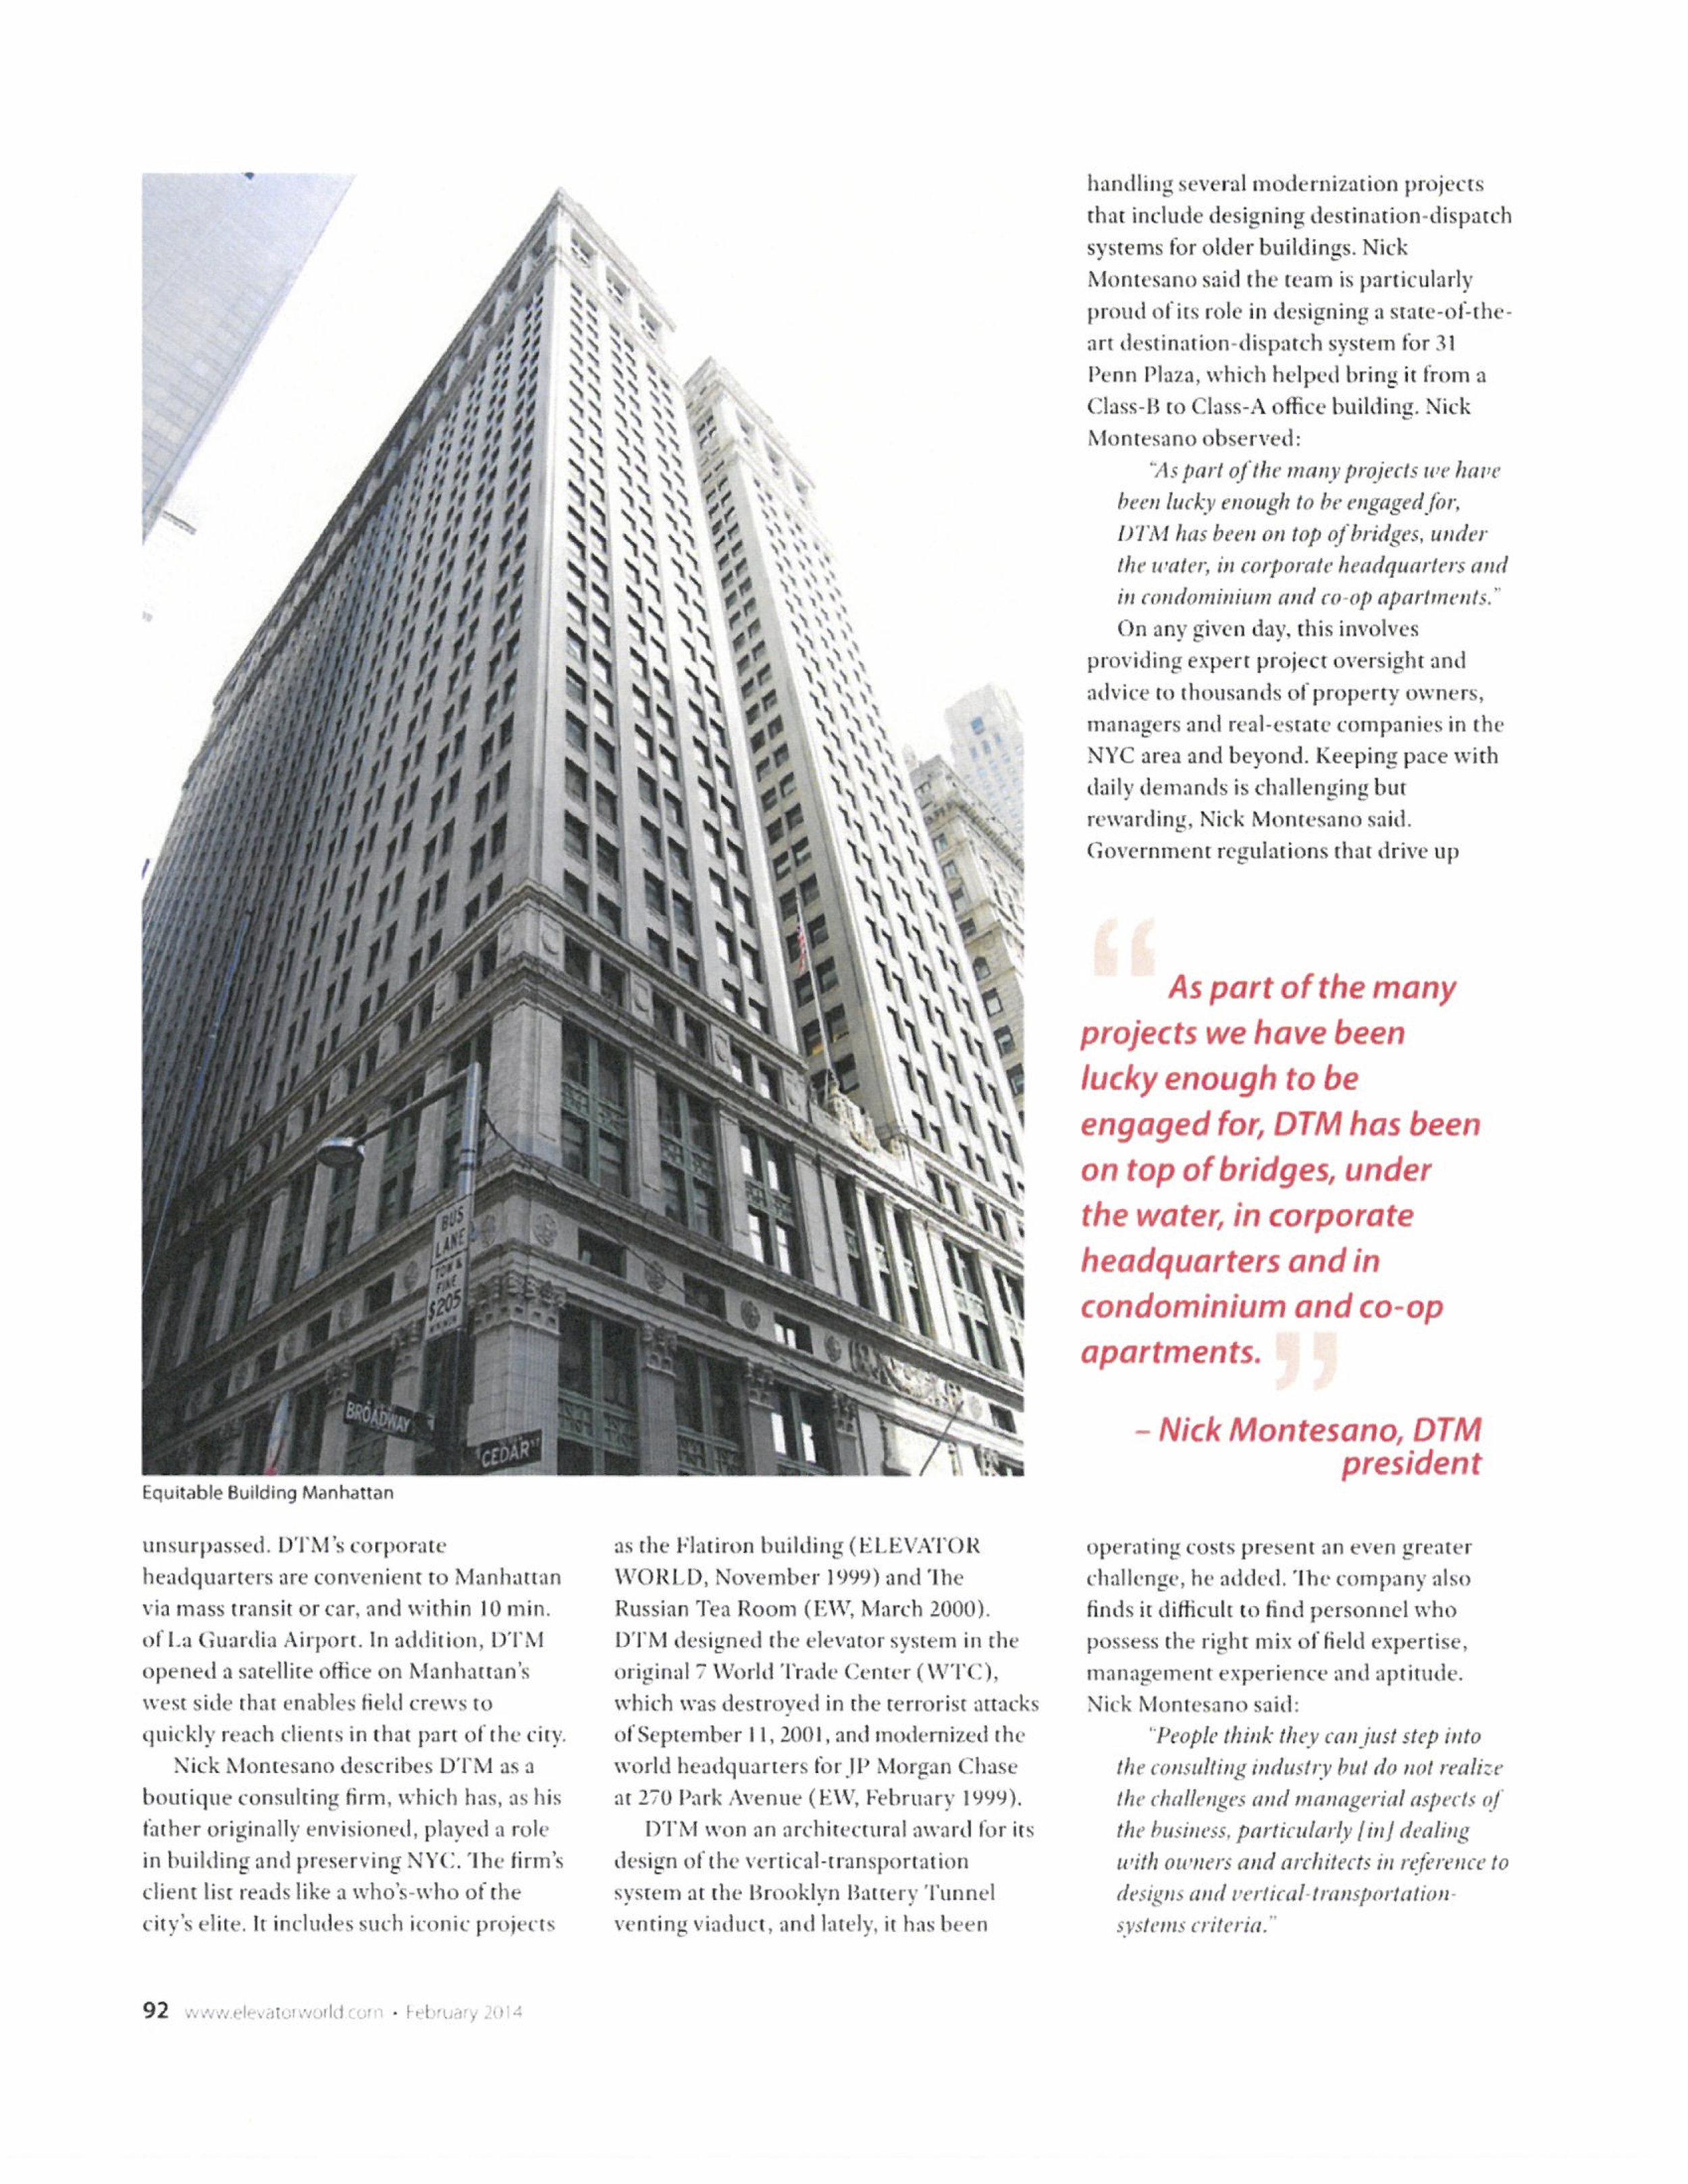 Elevator World Article on DTM 2014 2.jpg